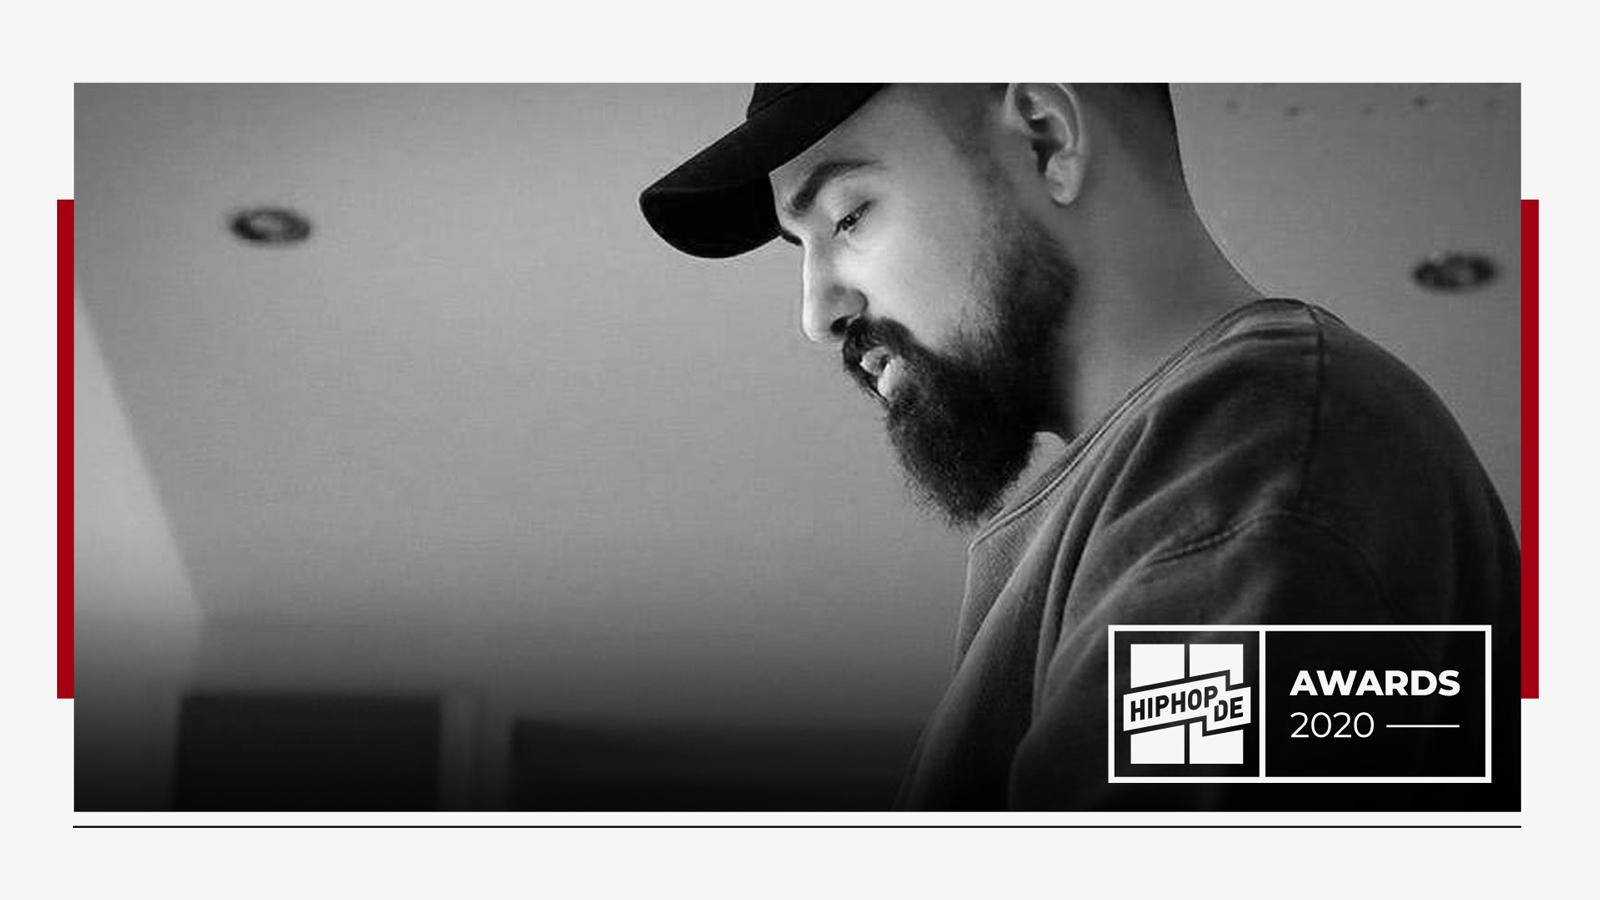 Wie OZ auch 2020 wieder alles rasiert hat – Hiphop.de Awards 2020